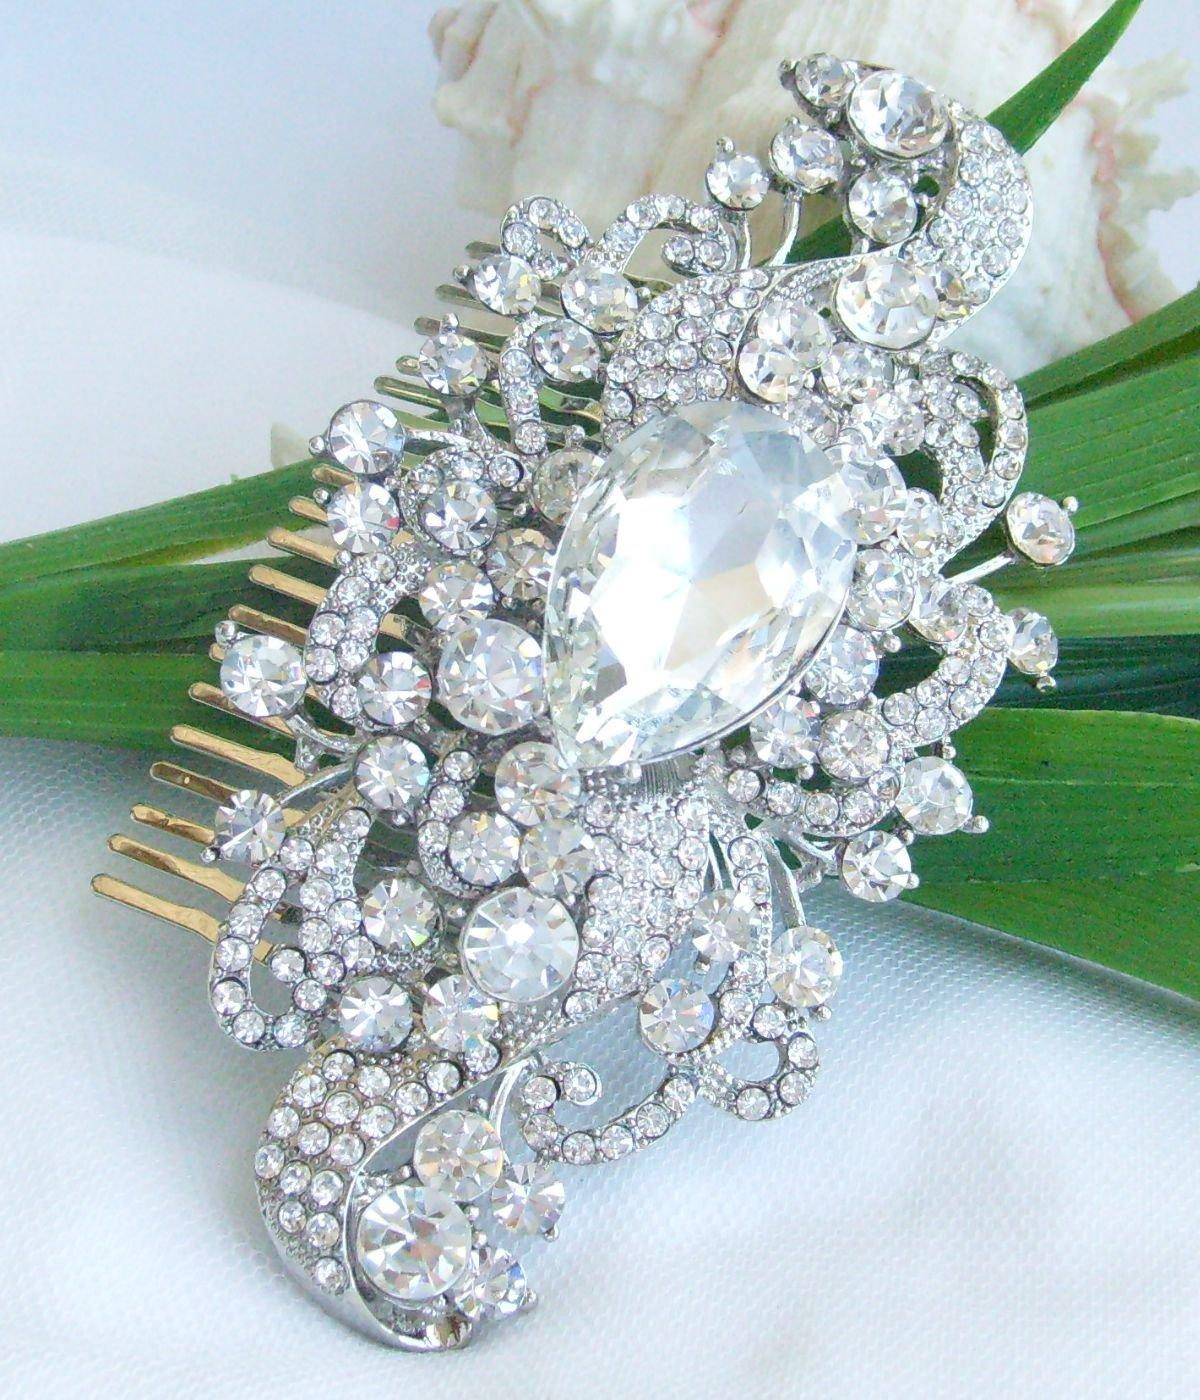 Sindary Wedding Headpiece 4.53 Inch Silver-tone Clear Rhinestone Crystal Flower Hair Comb by Sindary Jewelry (Image #3)